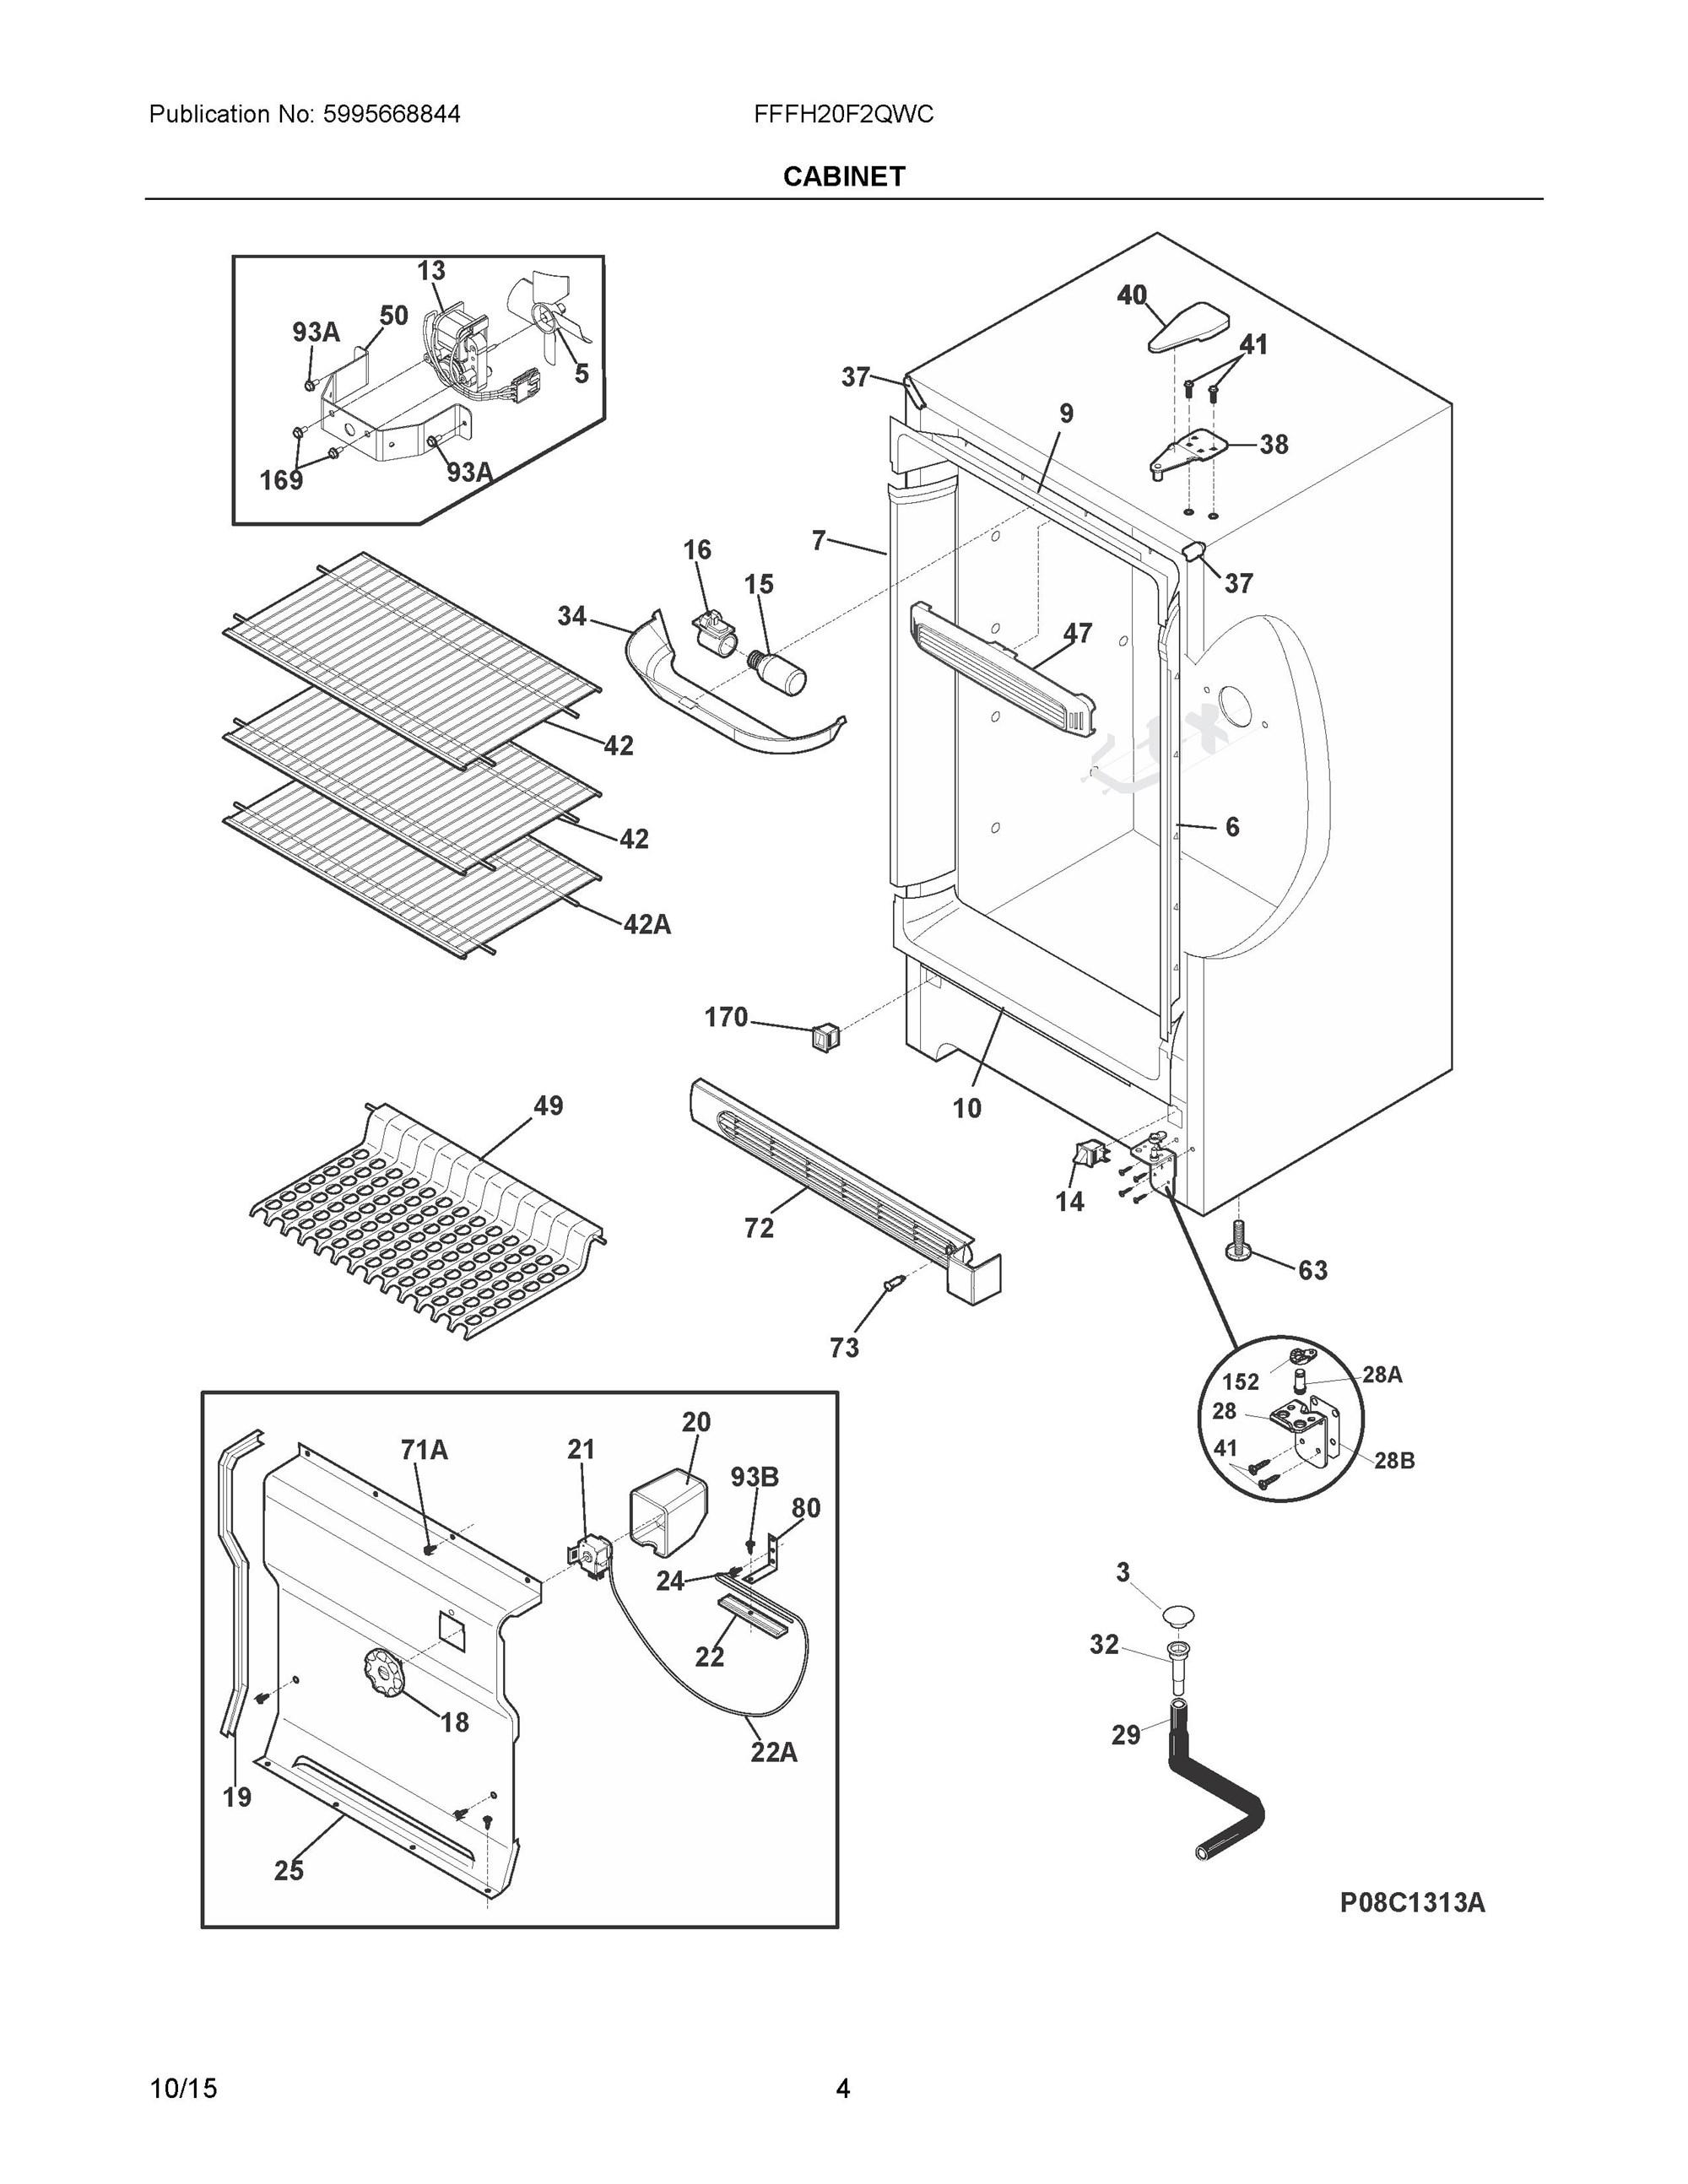 Fffh20f2qwc Cabinet Frigidaire Company Appliance Parts